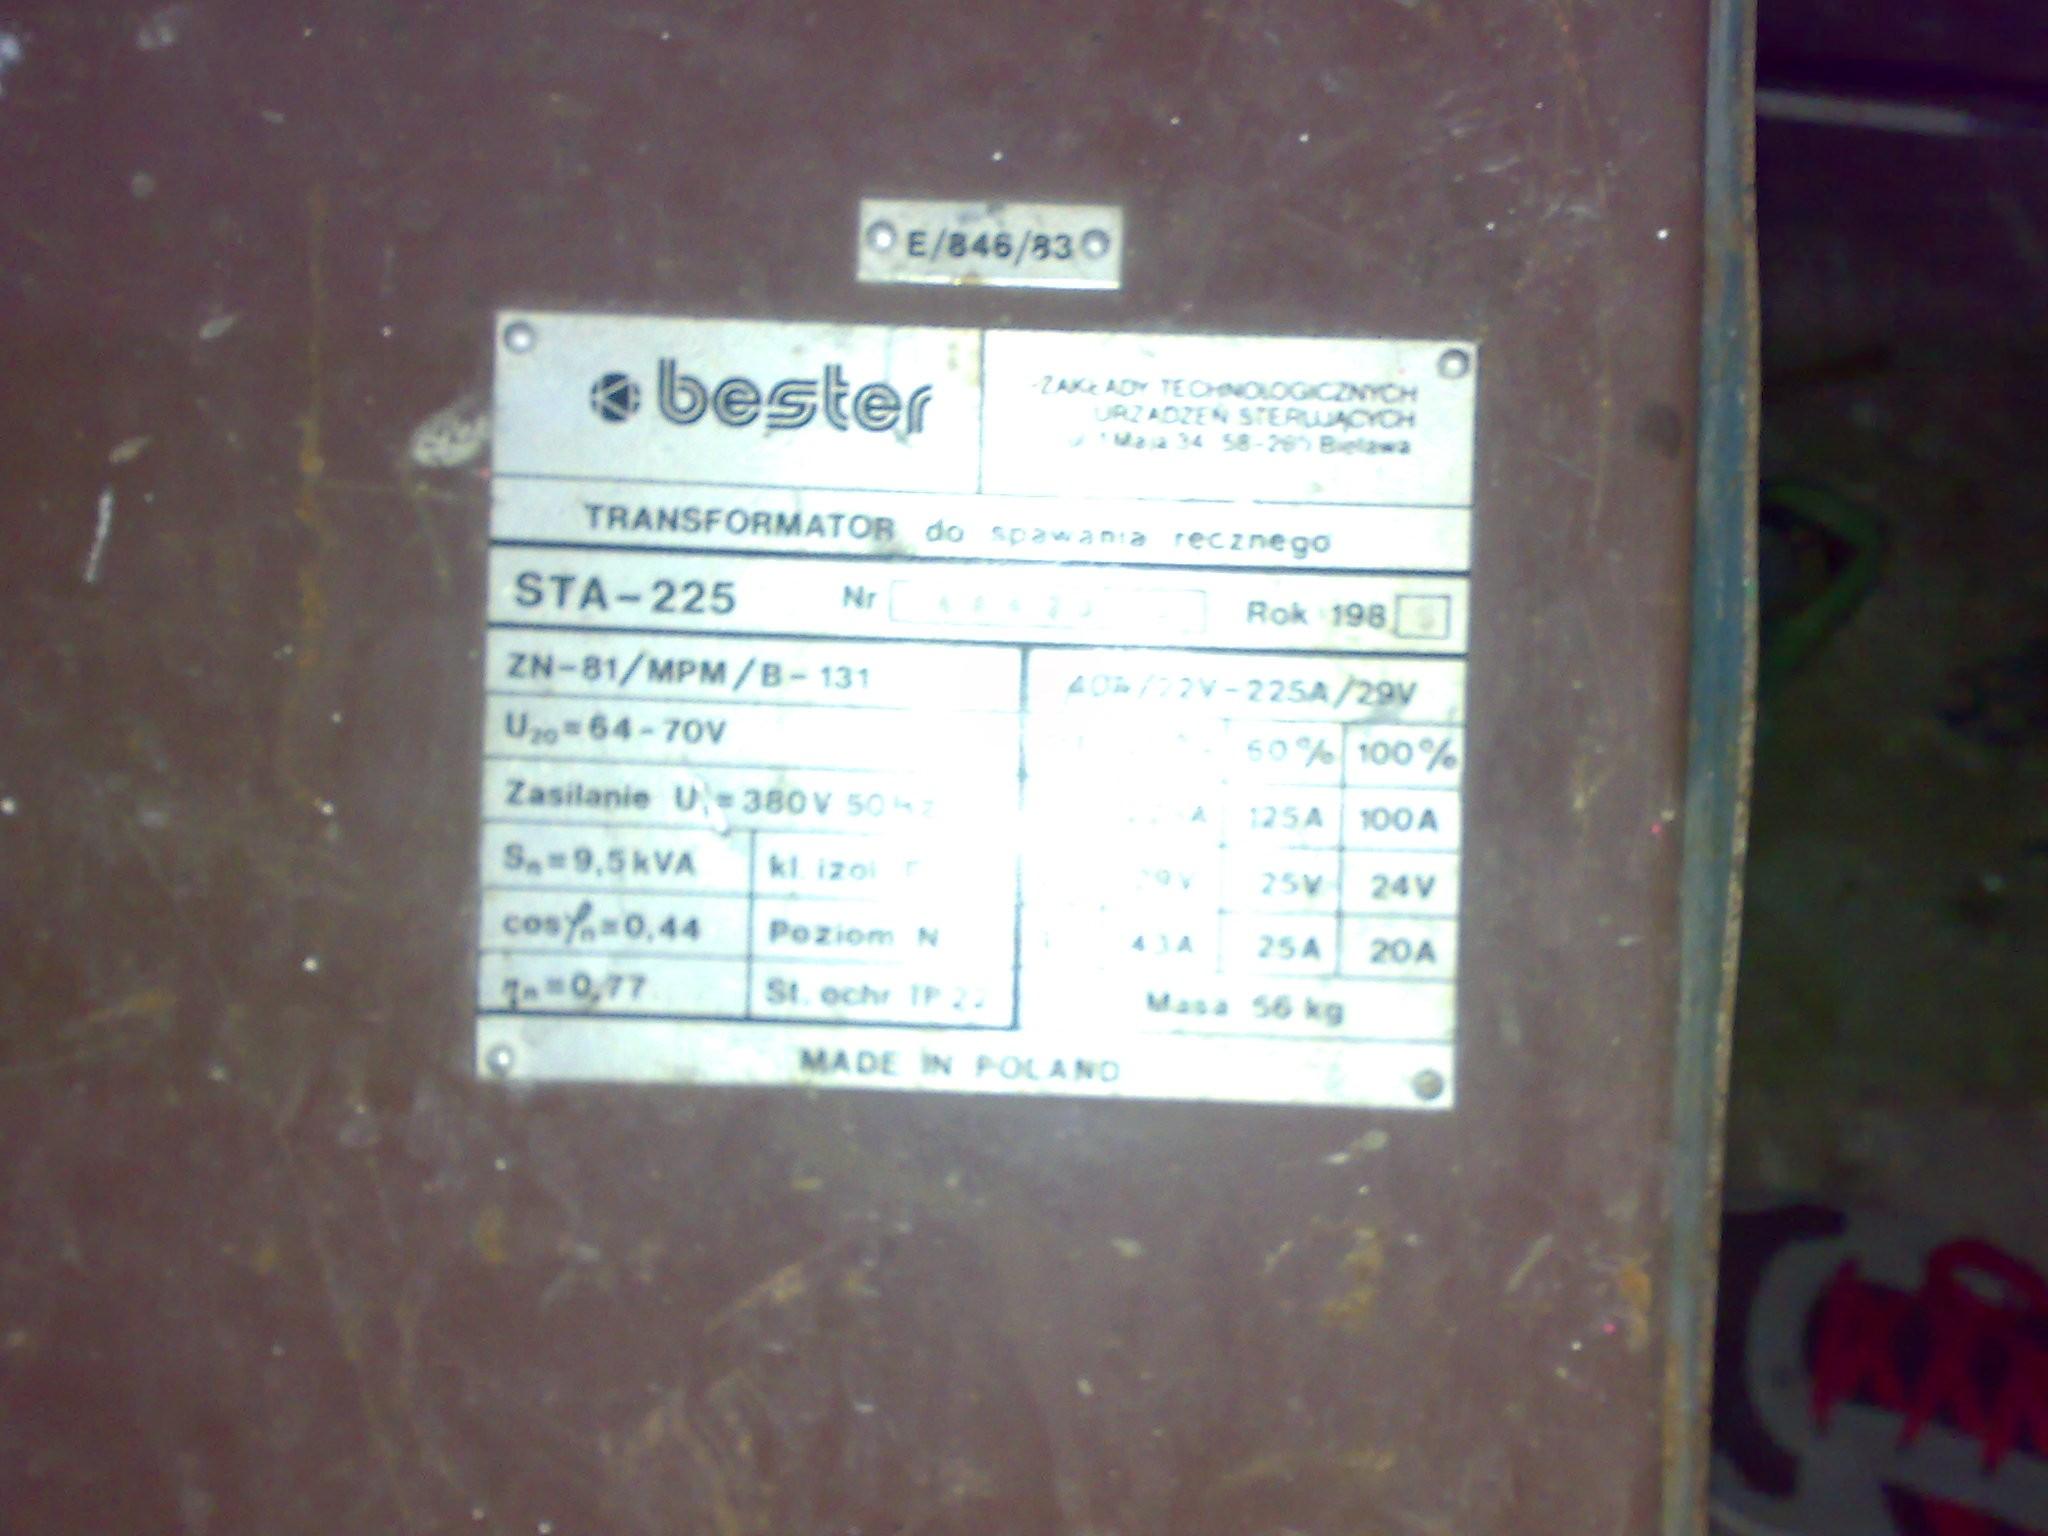 Bester STA225-Czy mo�na doda� funkcj� tig-a?